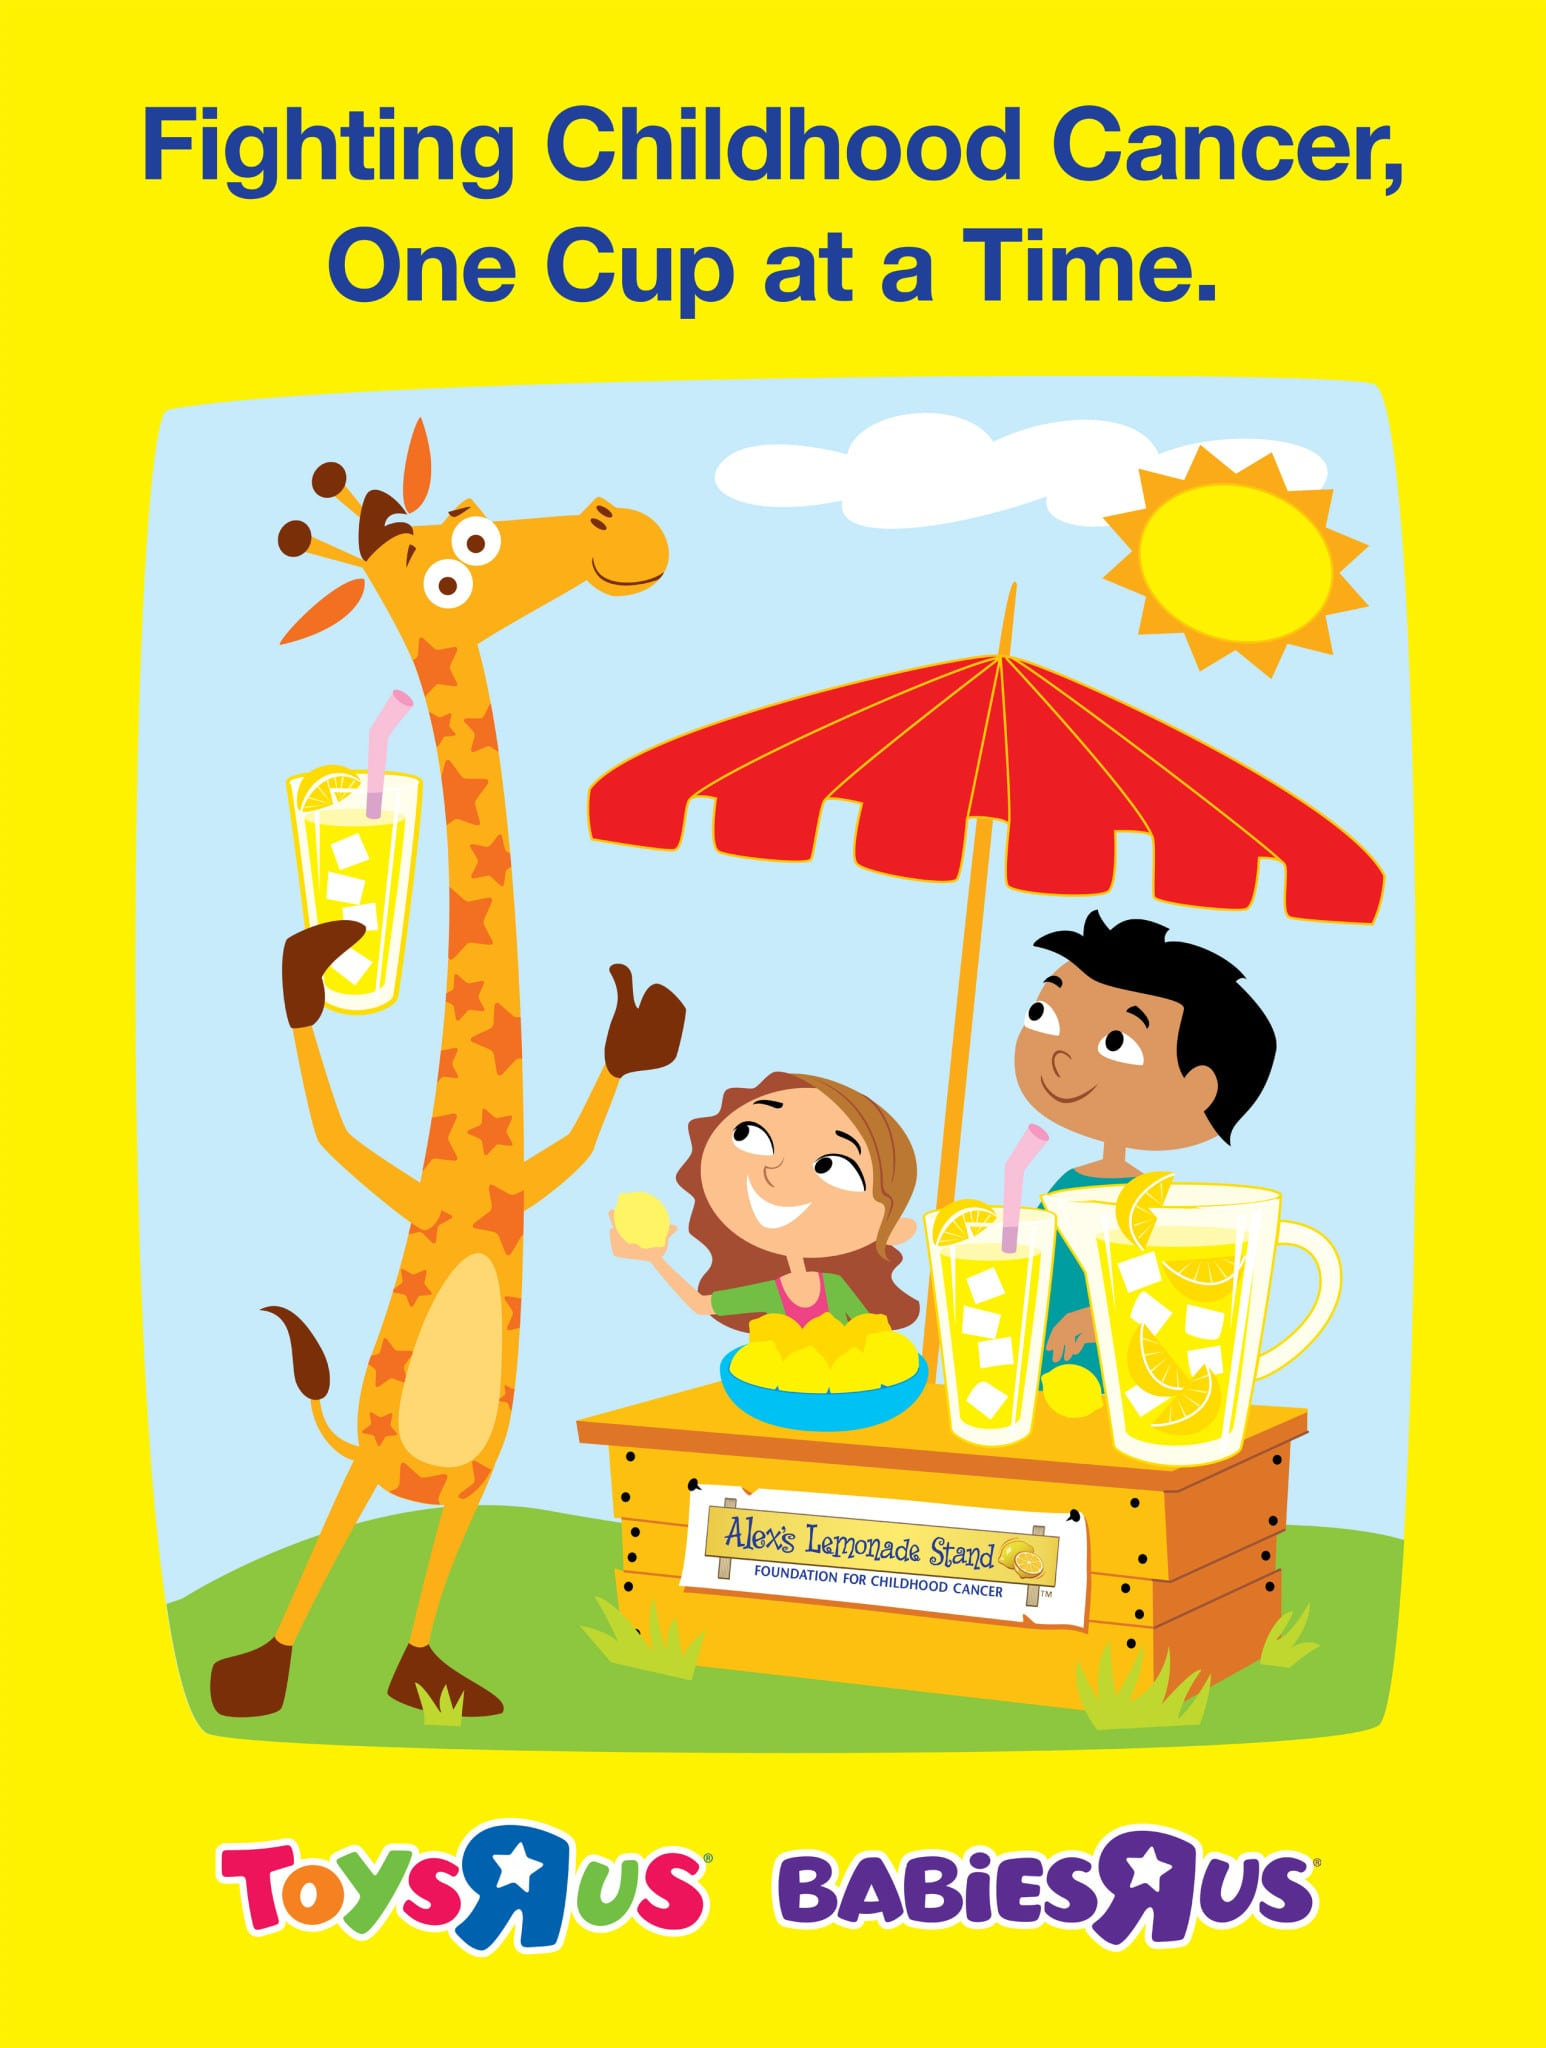 Toys R Us Lemonade Stand : Csr awards corporate community partnership pr news